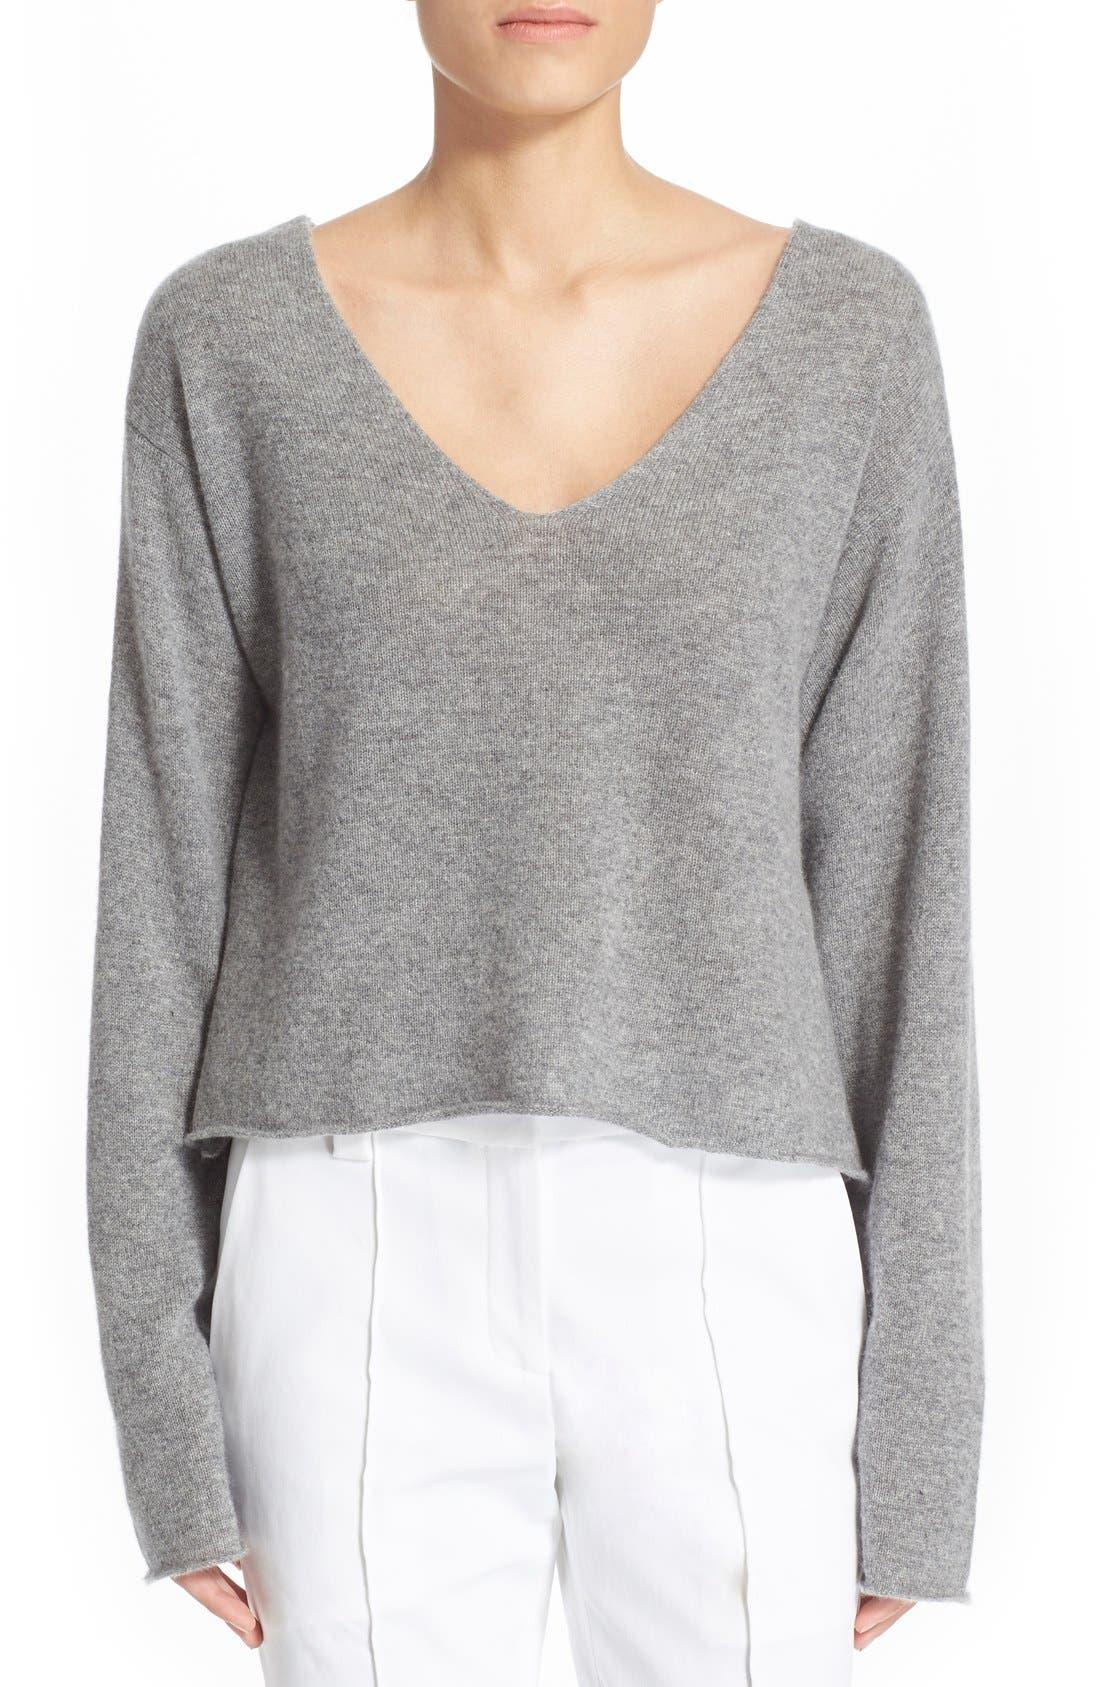 'Martin' Cashmere Crop Sweater,                             Main thumbnail 1, color,                             020